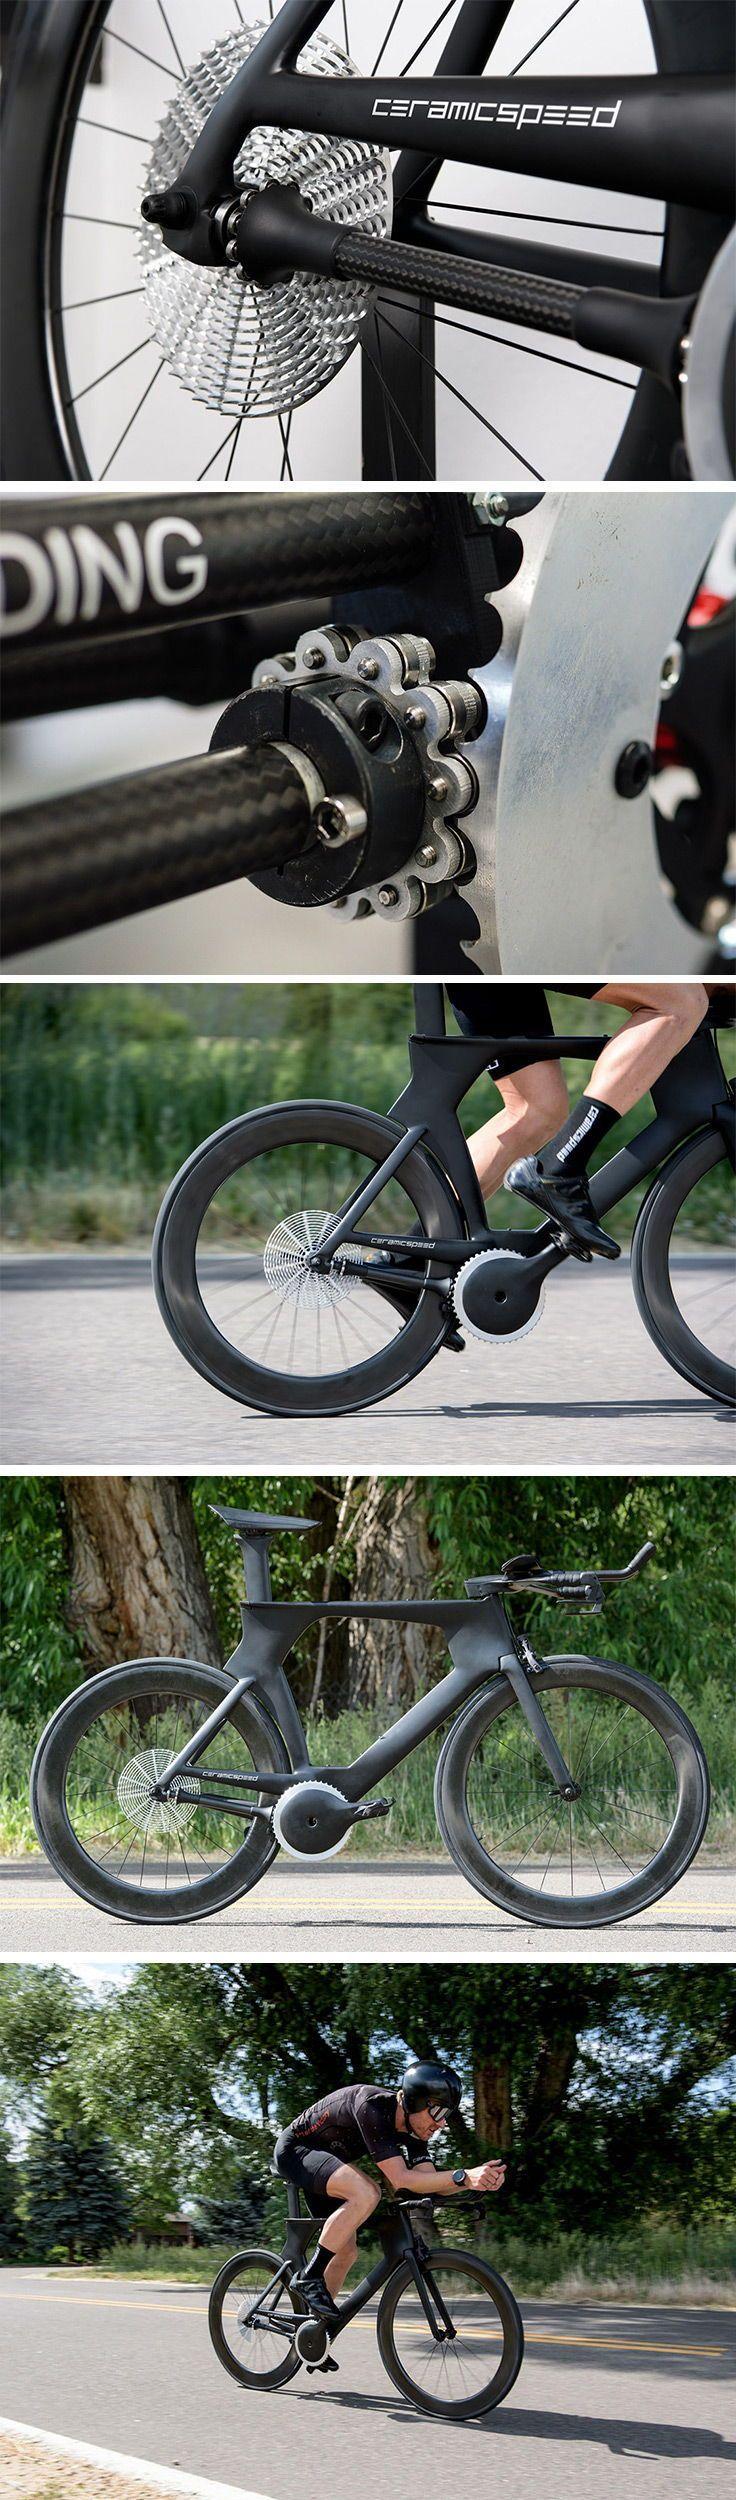 Sample Page Bicycle Bicycle Design Bike Design